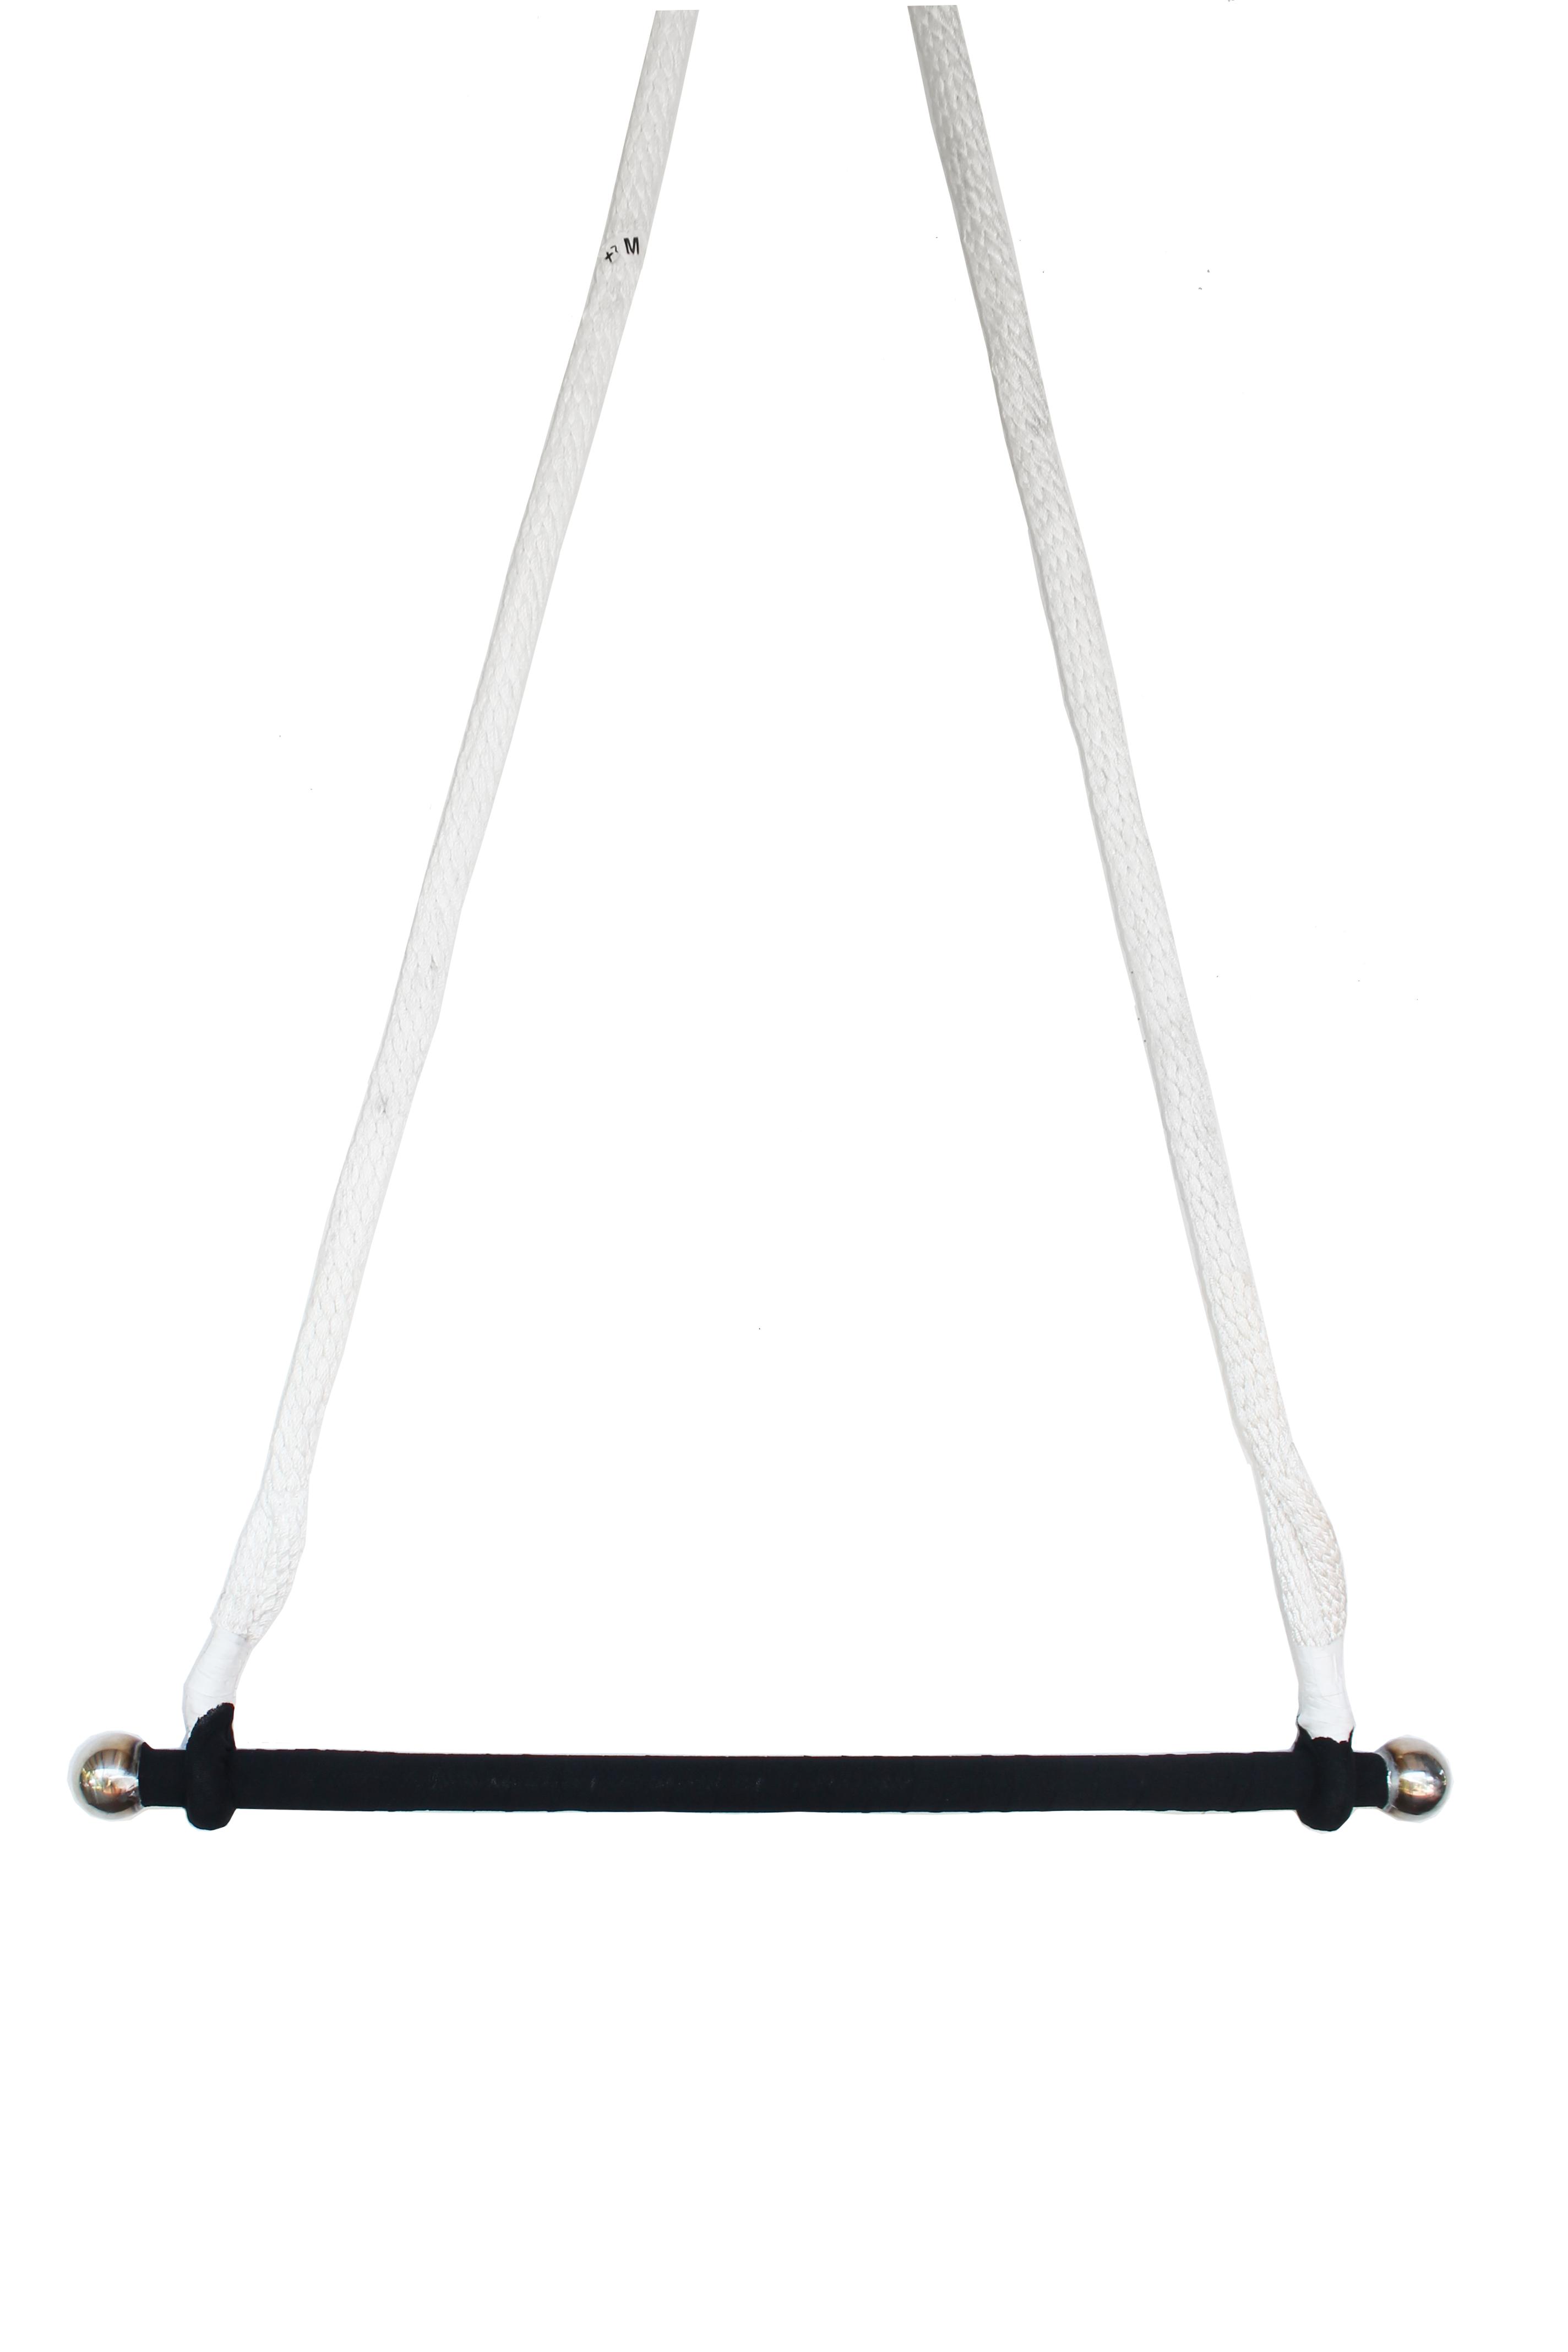 Trapeze Bars For Sale